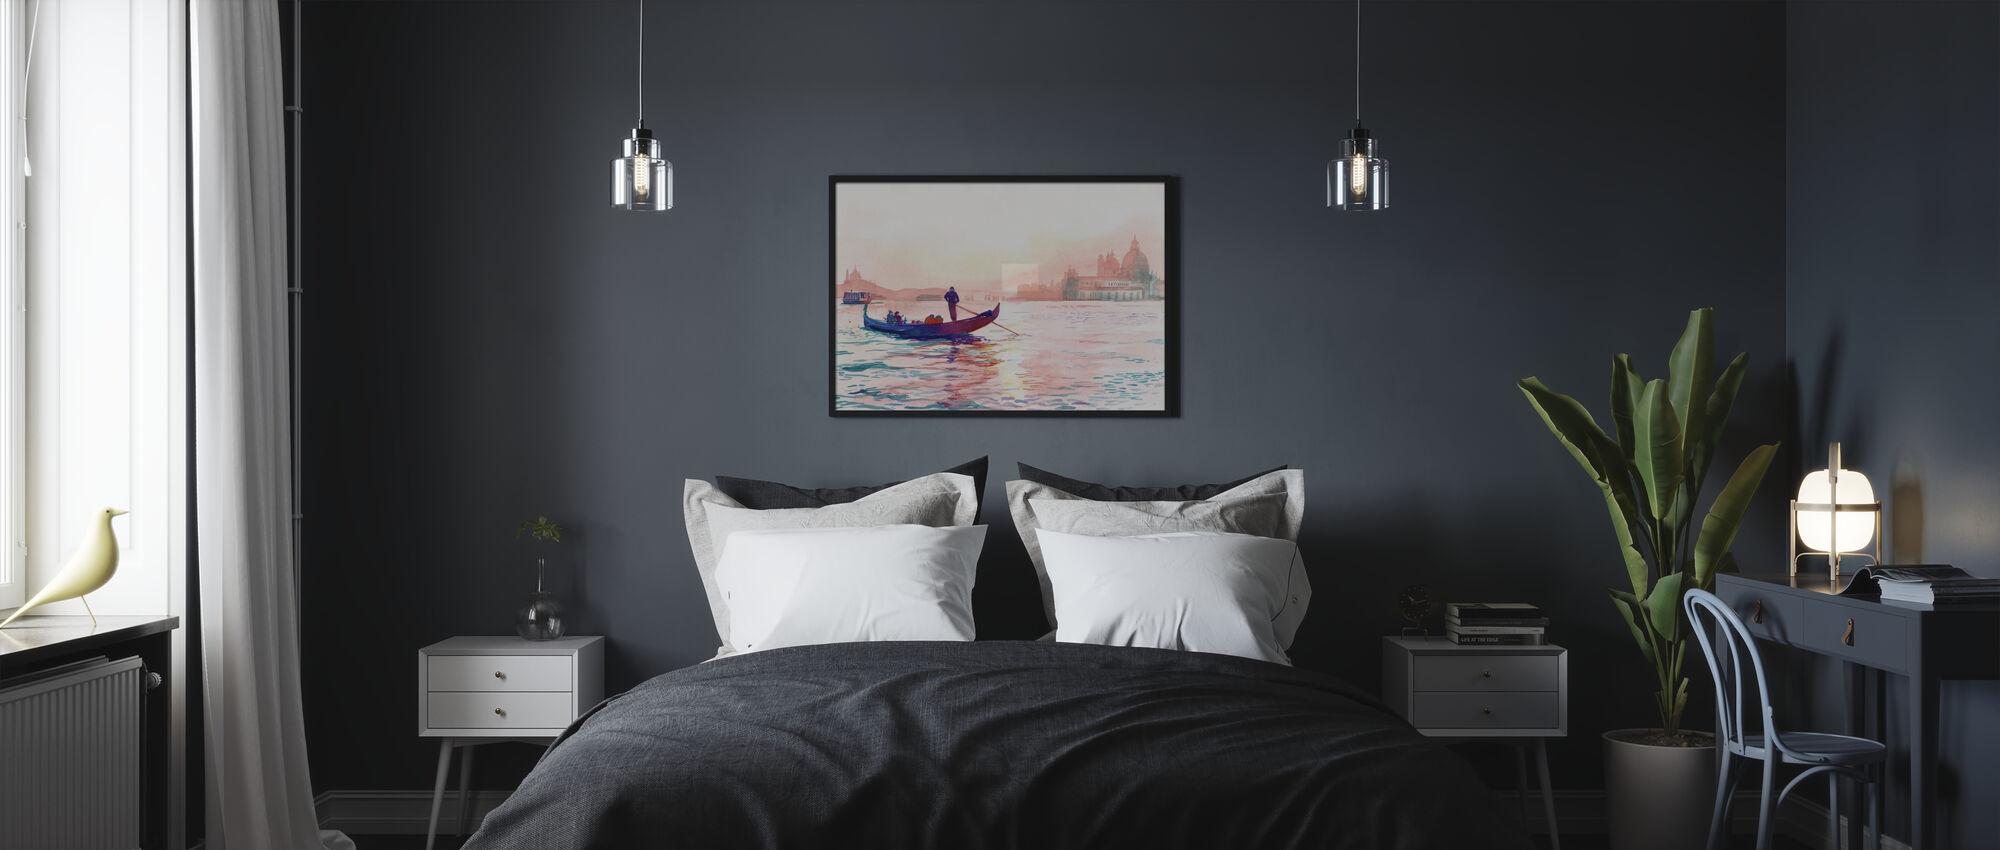 The Grand Hotel Venice - Framed print - Bedroom